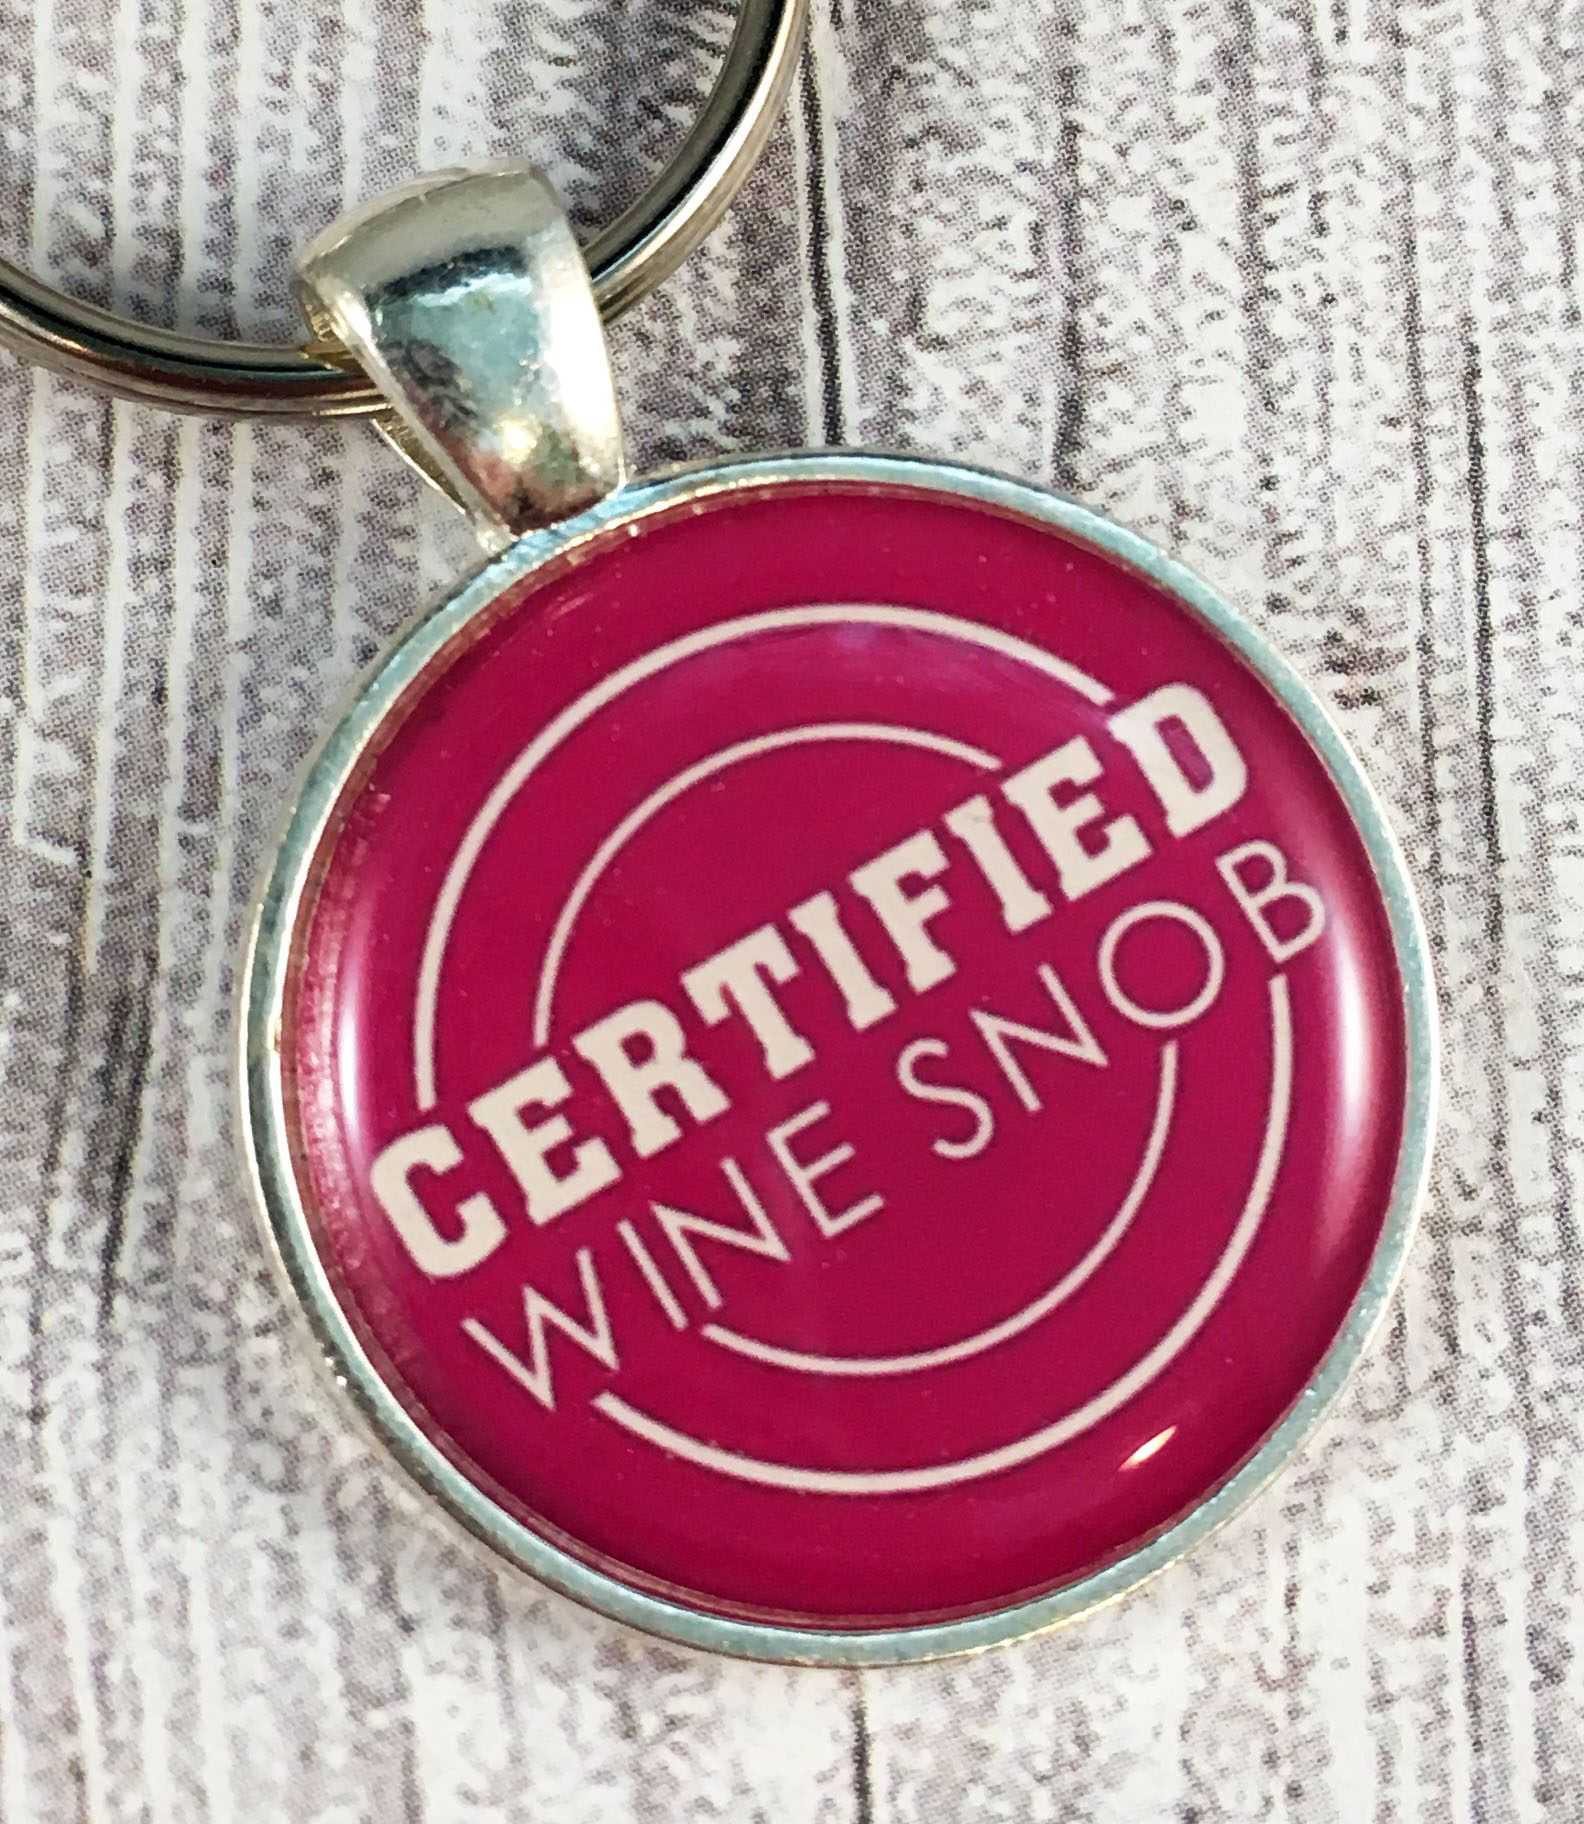 Certified Wine Snob Wine Gifts Wine Lover Funny Wine Gifts Wine Key Chain Silly Key Chain Silly Gi Gifts For Wine Lovers Funny Wine Gifts Wine Snob